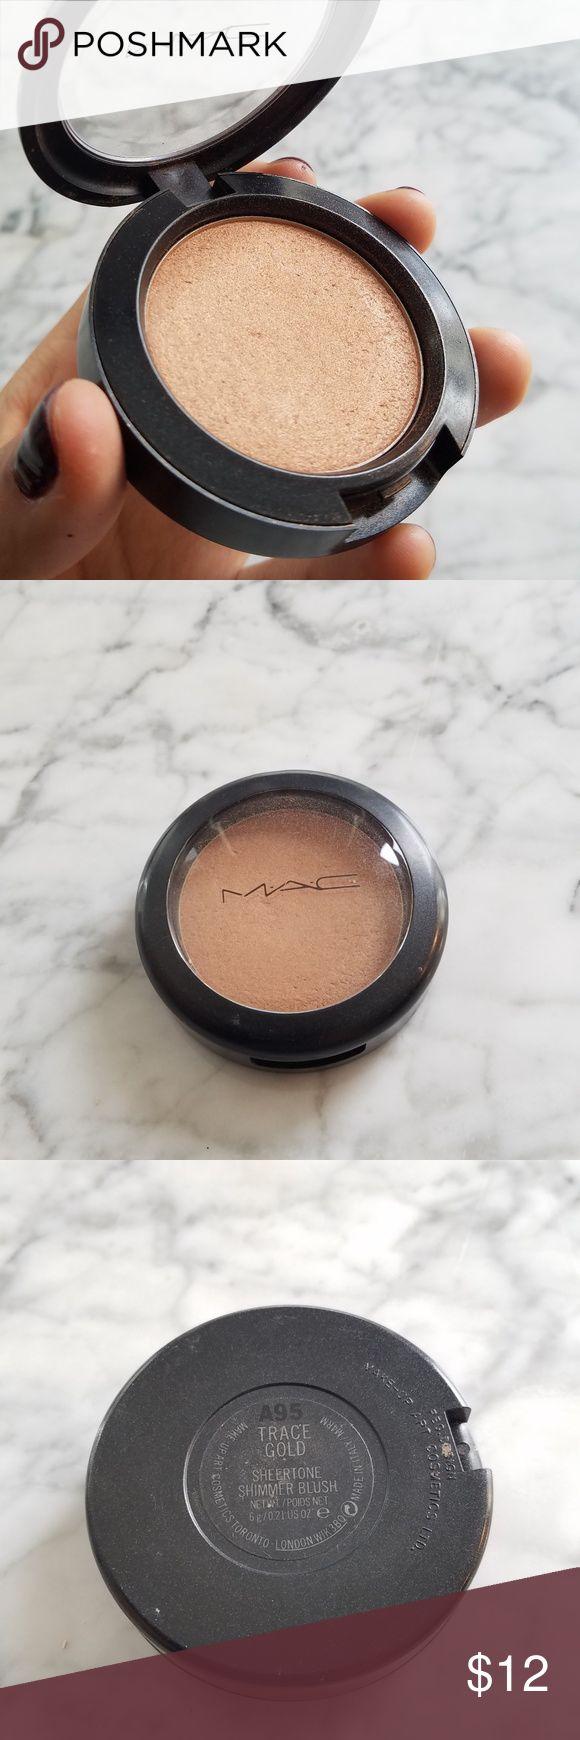 MAC Trace of Gold Highlighter Highlighter, Mac cosmetics